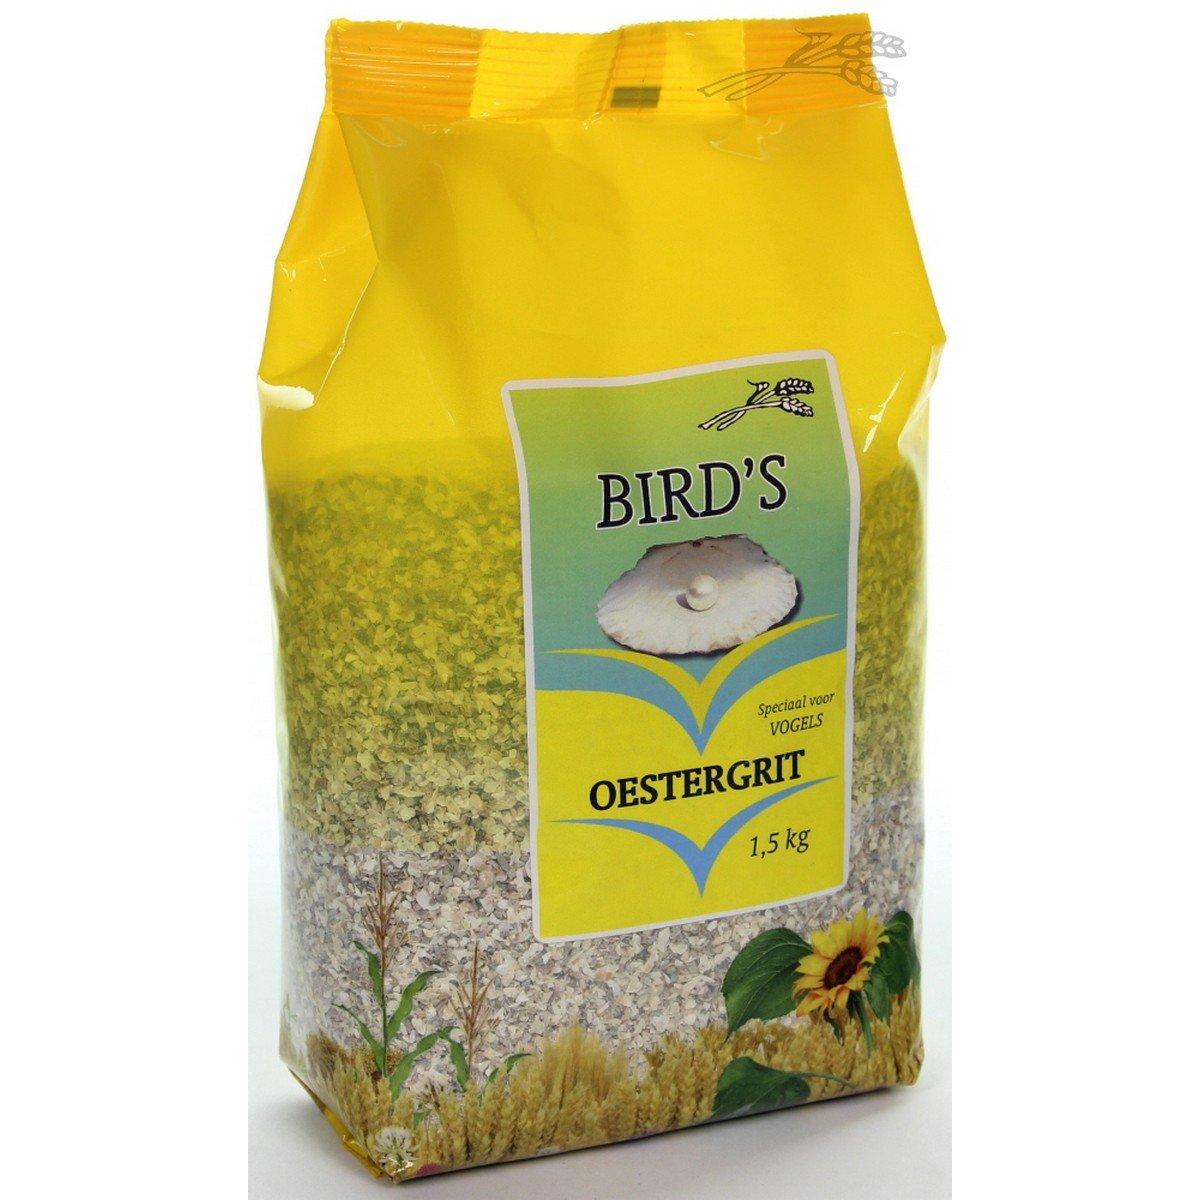 Afbeelding van Birds Oestergrit No 1 Vogels 1,5kg